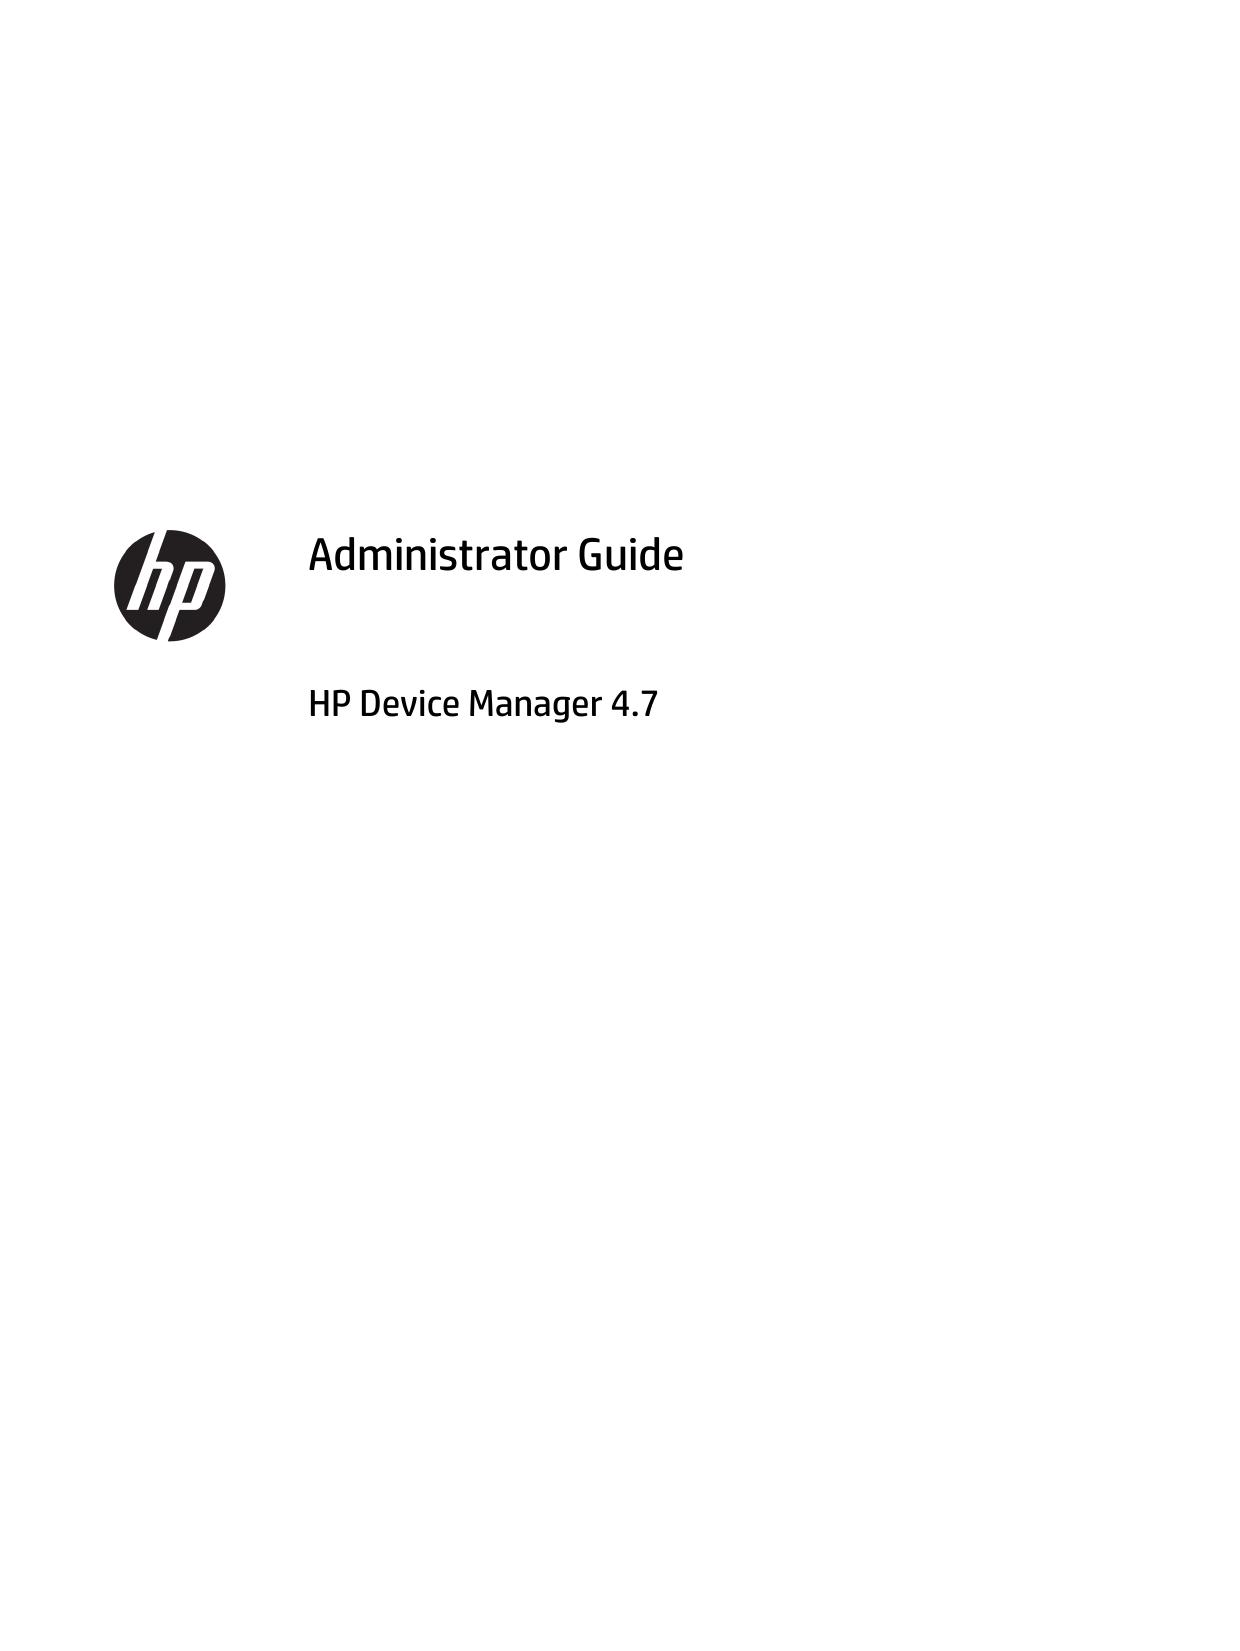 Administrator Guide HP Device Manager 4 7   manualzz com